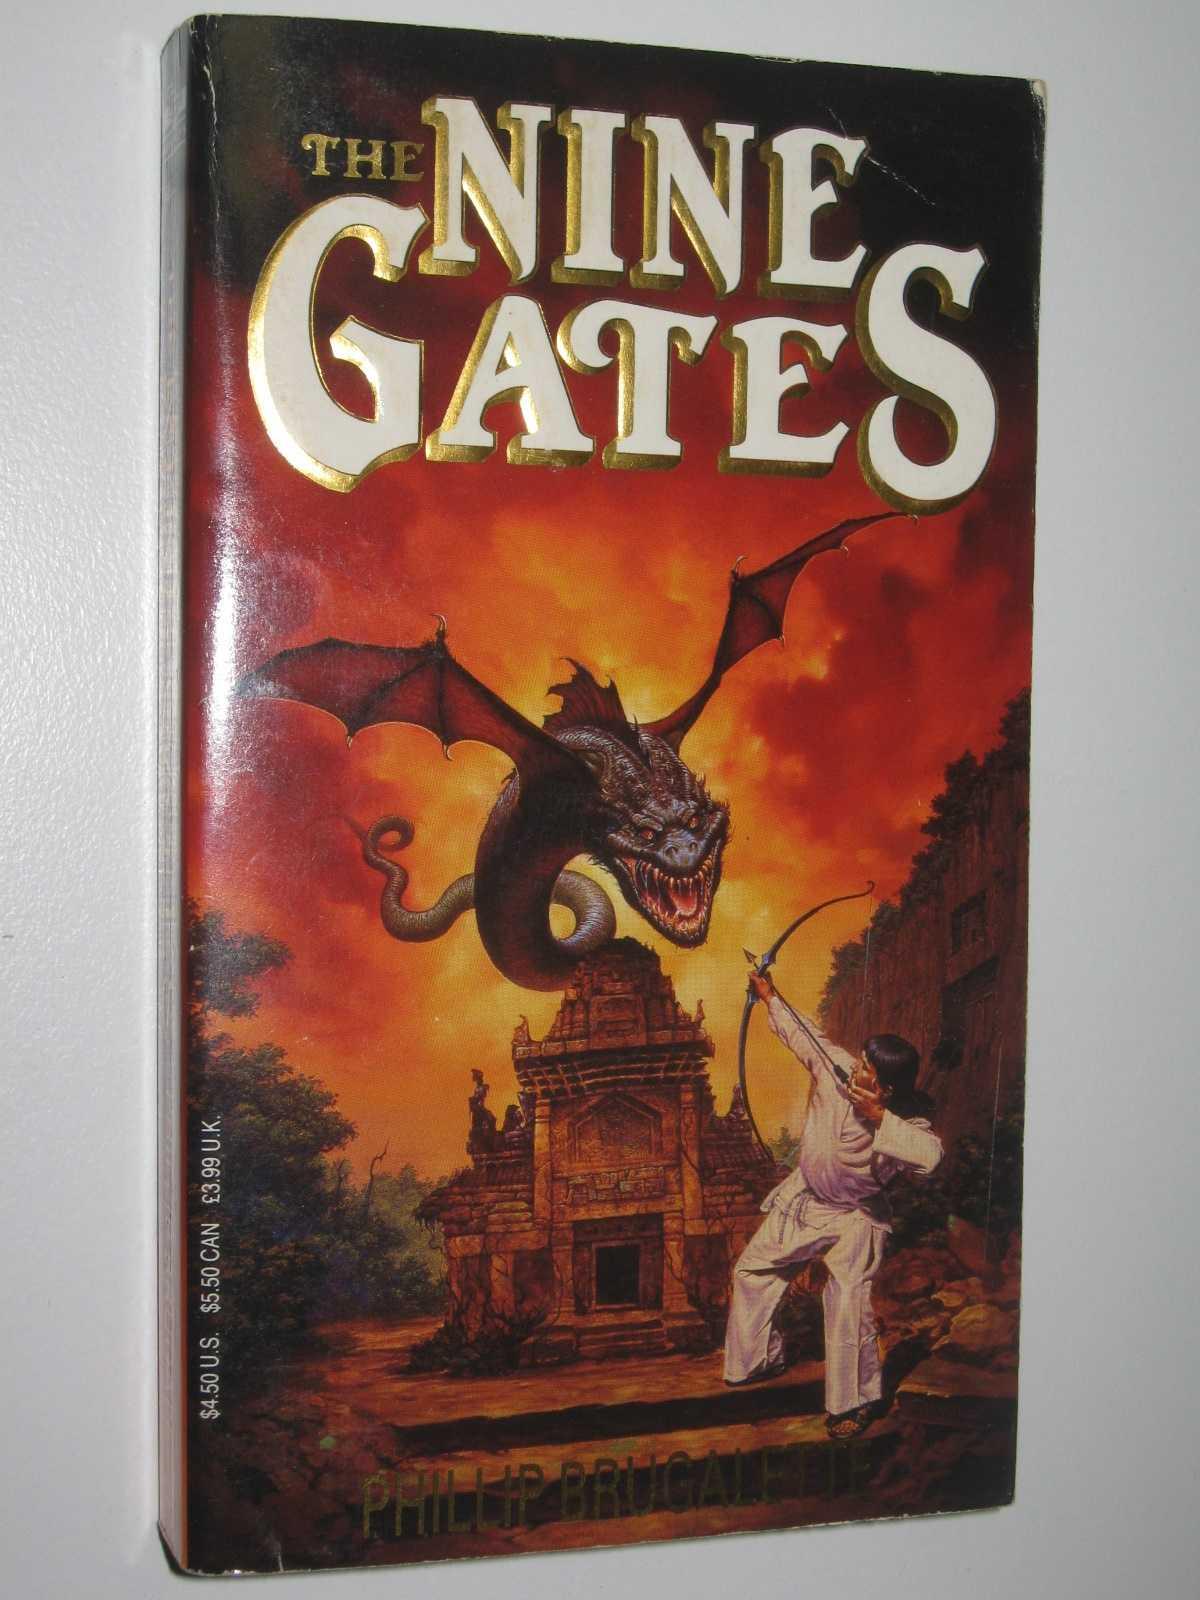 The Nine Gates, Brugalette, Phillip